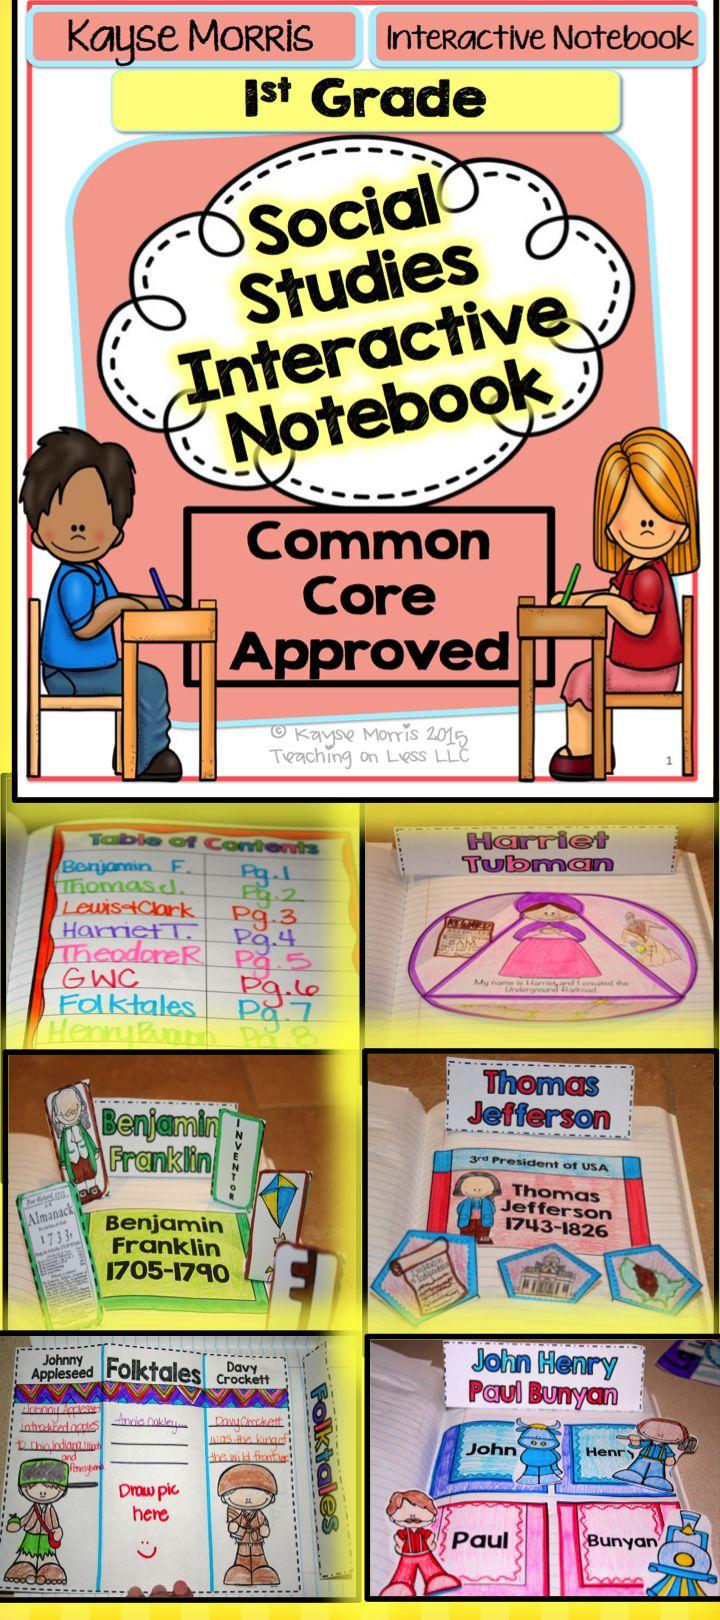 Social Studies Interactive Notebook  1st Grade Kayse Morris Teachers Pay Teachers It POPS UP!!